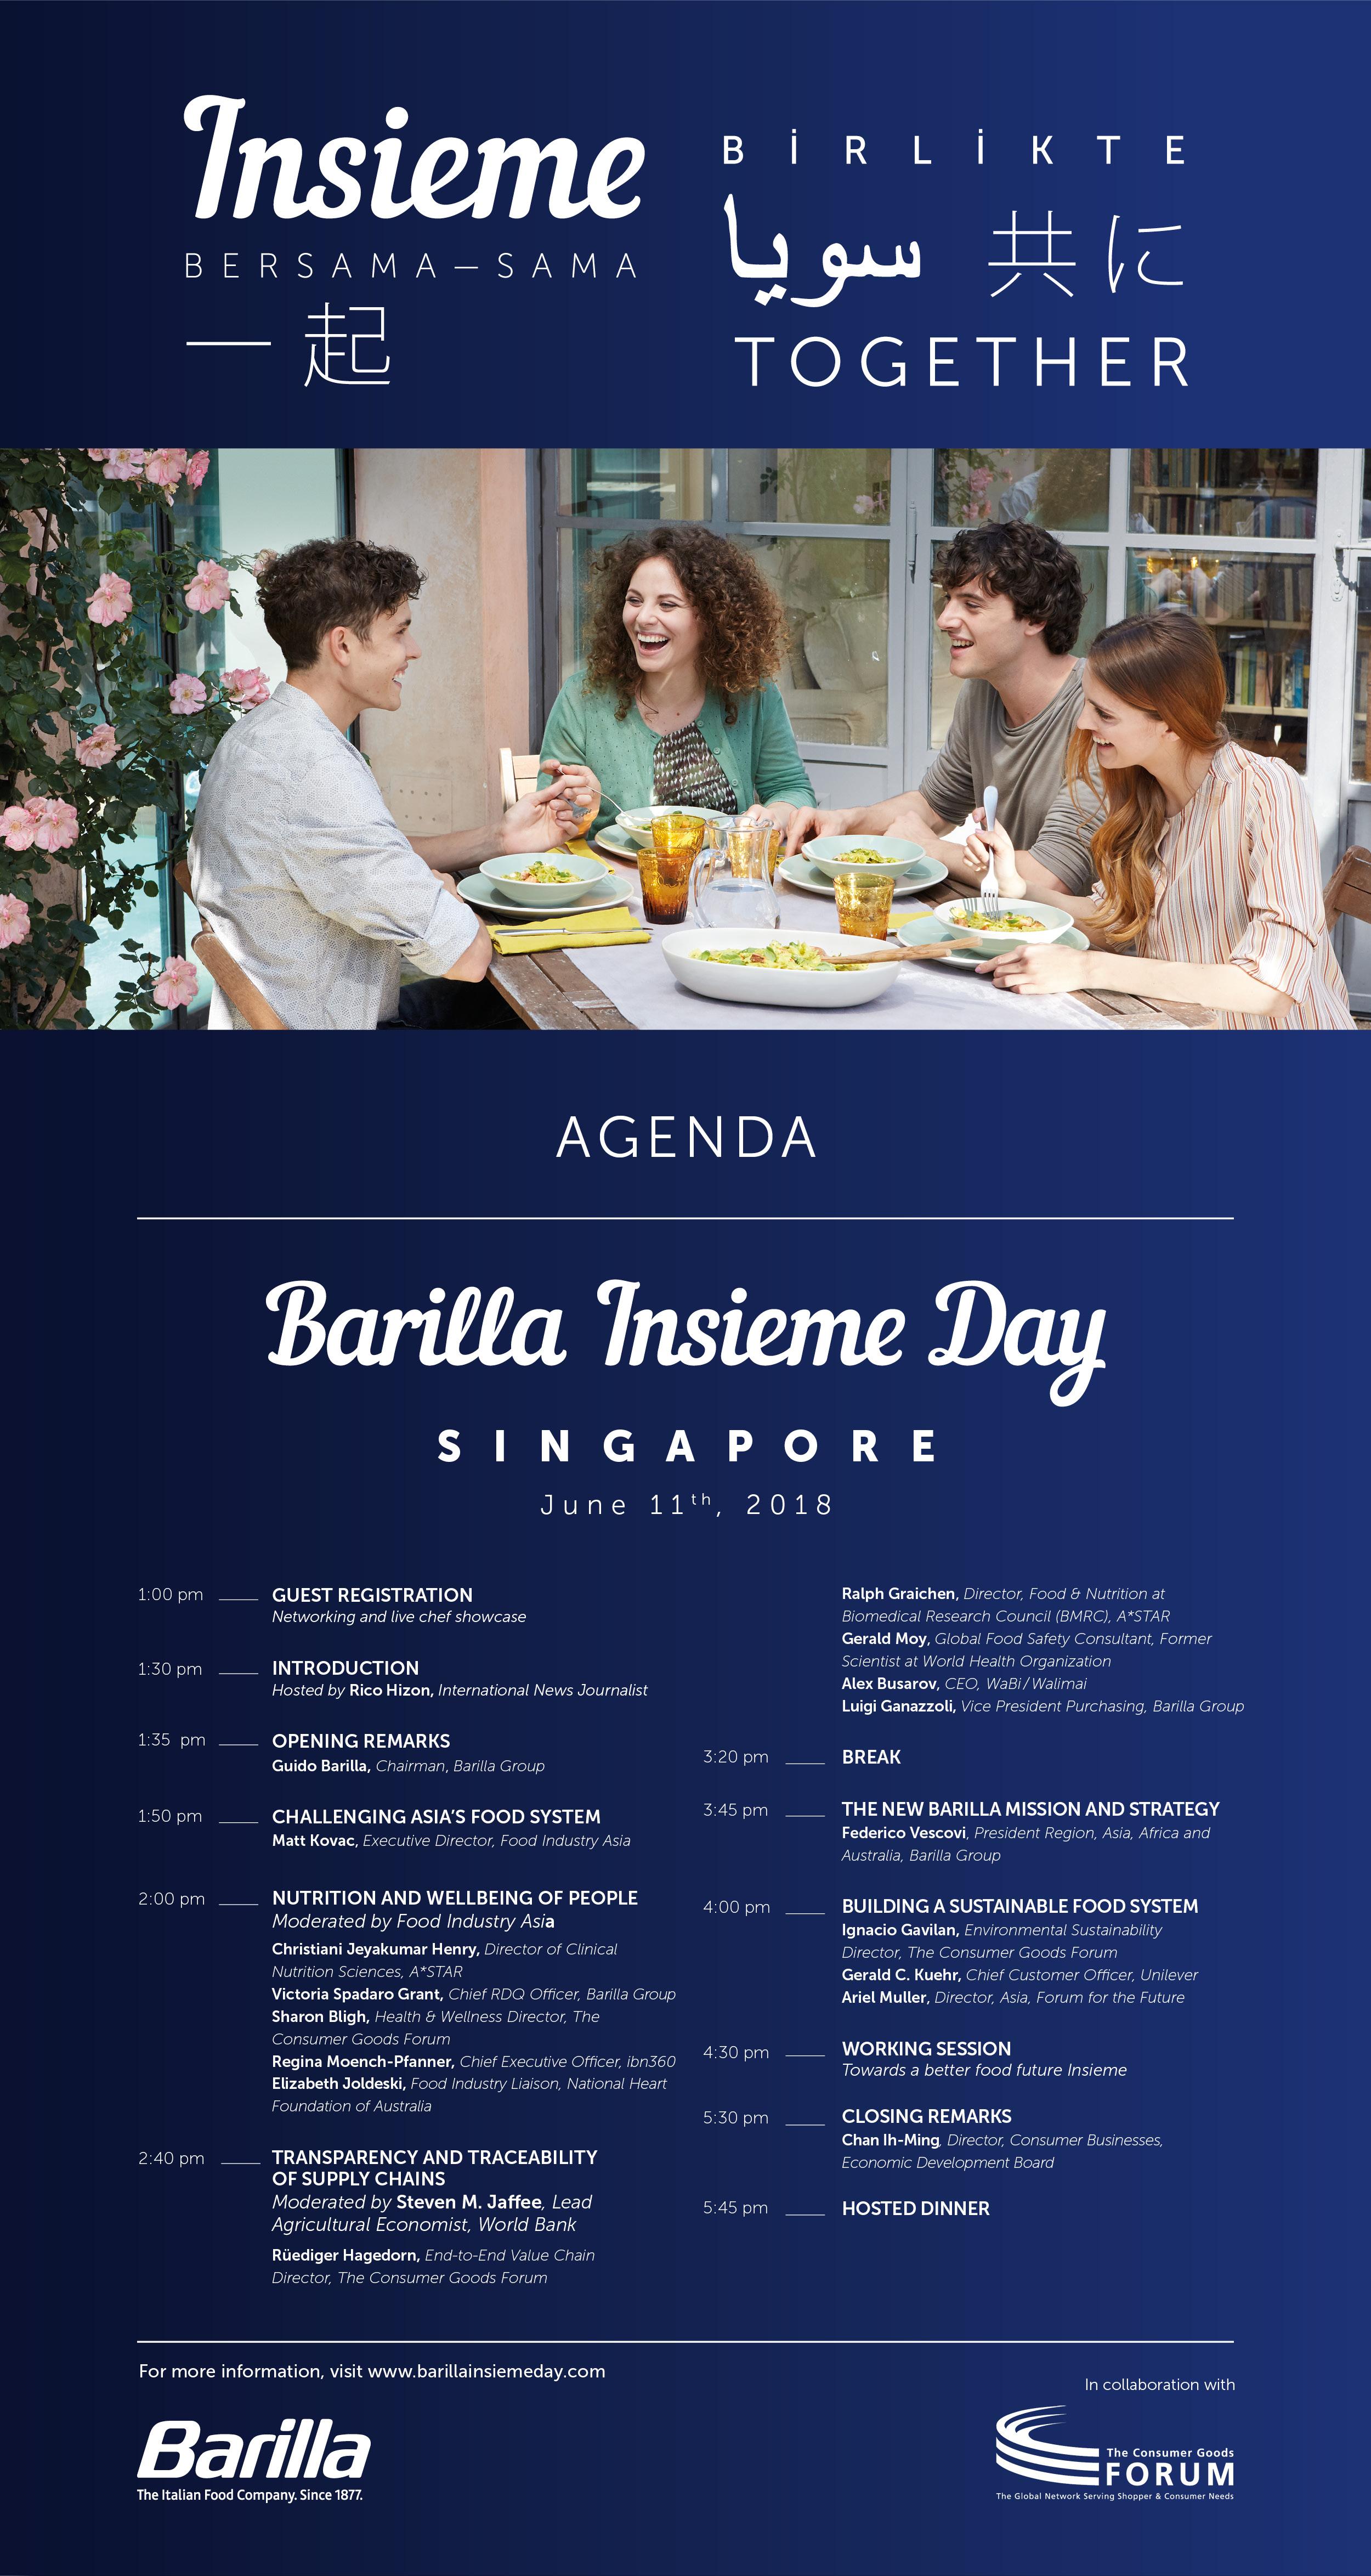 180607_Agenda_Singapore_Barilla.jpg